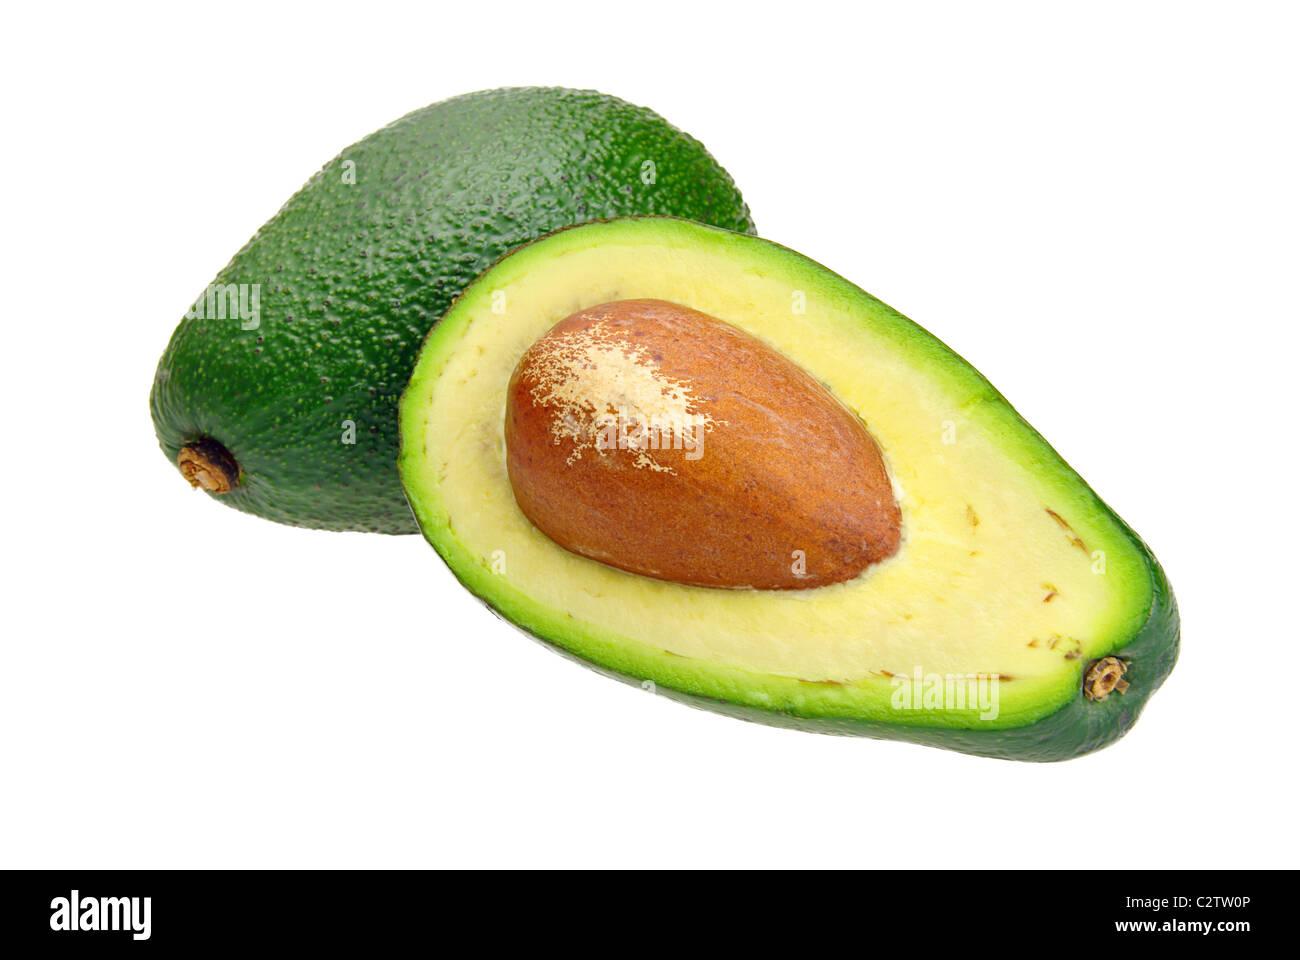 Avocado 06 - Stock Image